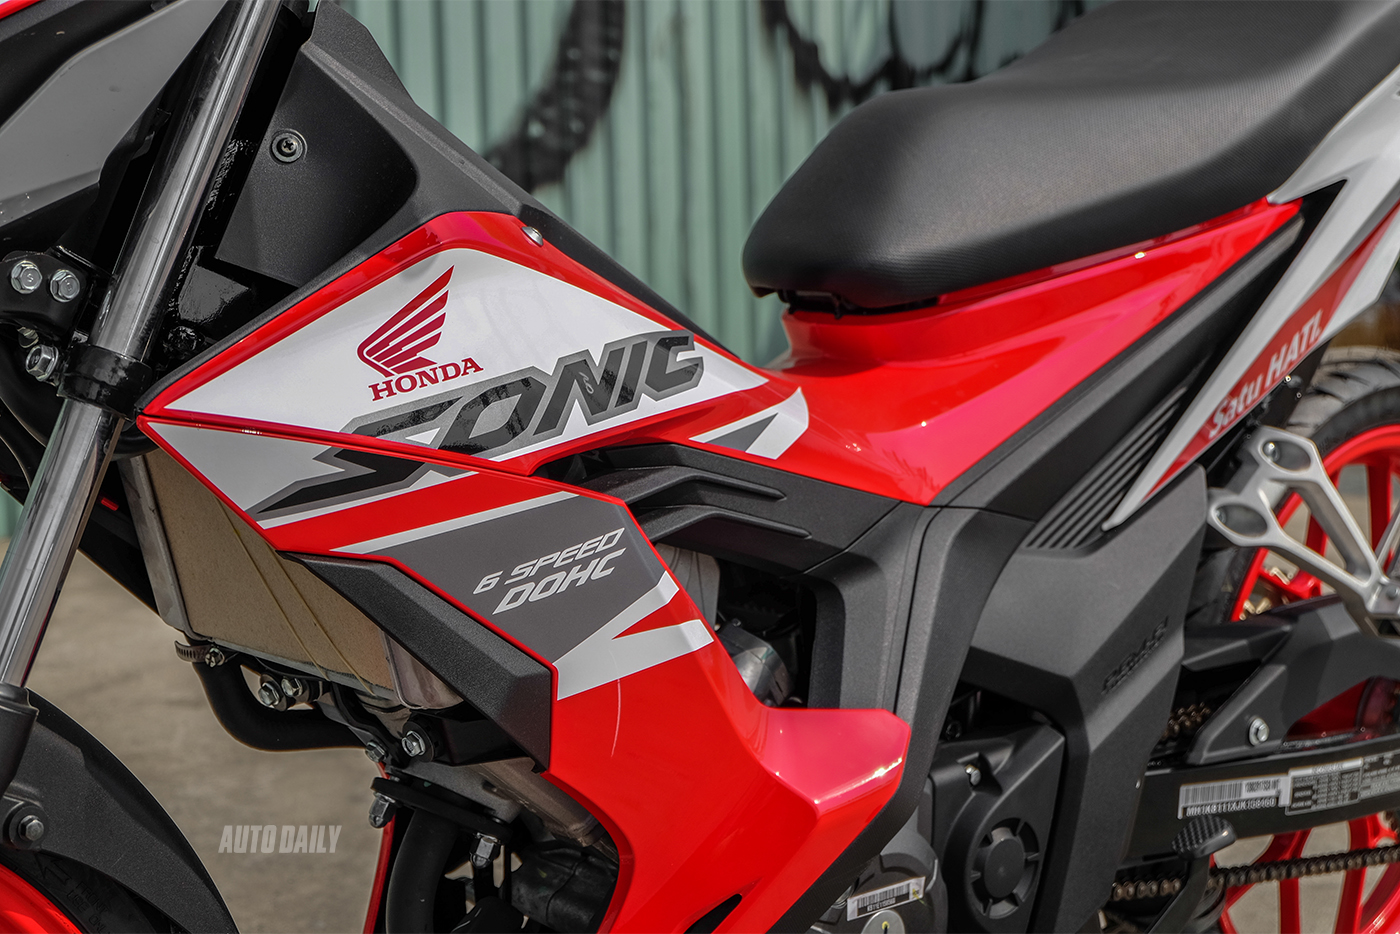 honda-sonic-150r-1.jpg